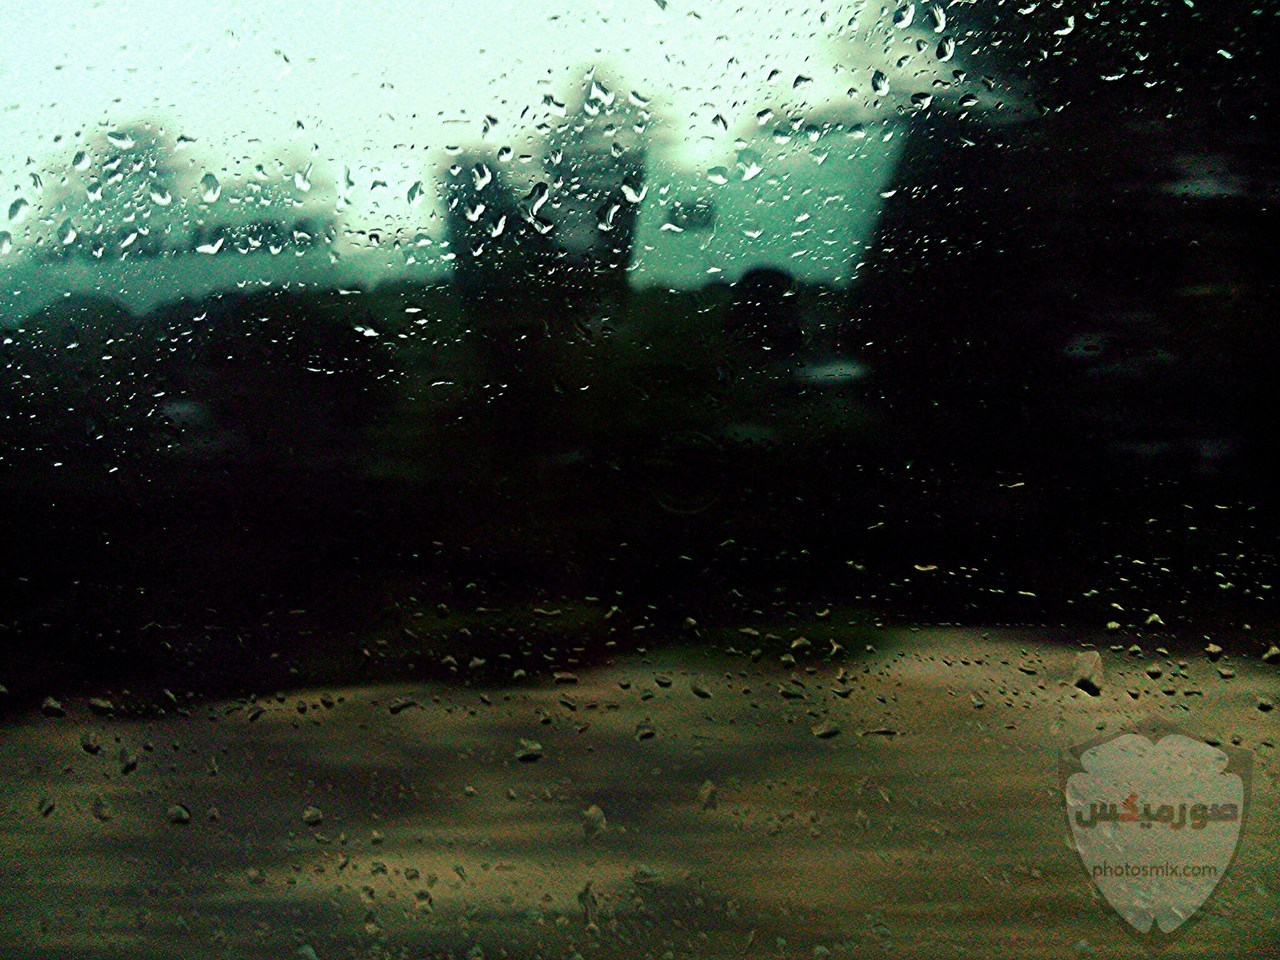 صور مطر جديدة 2020 photos rain خلفيات مطر 8 1